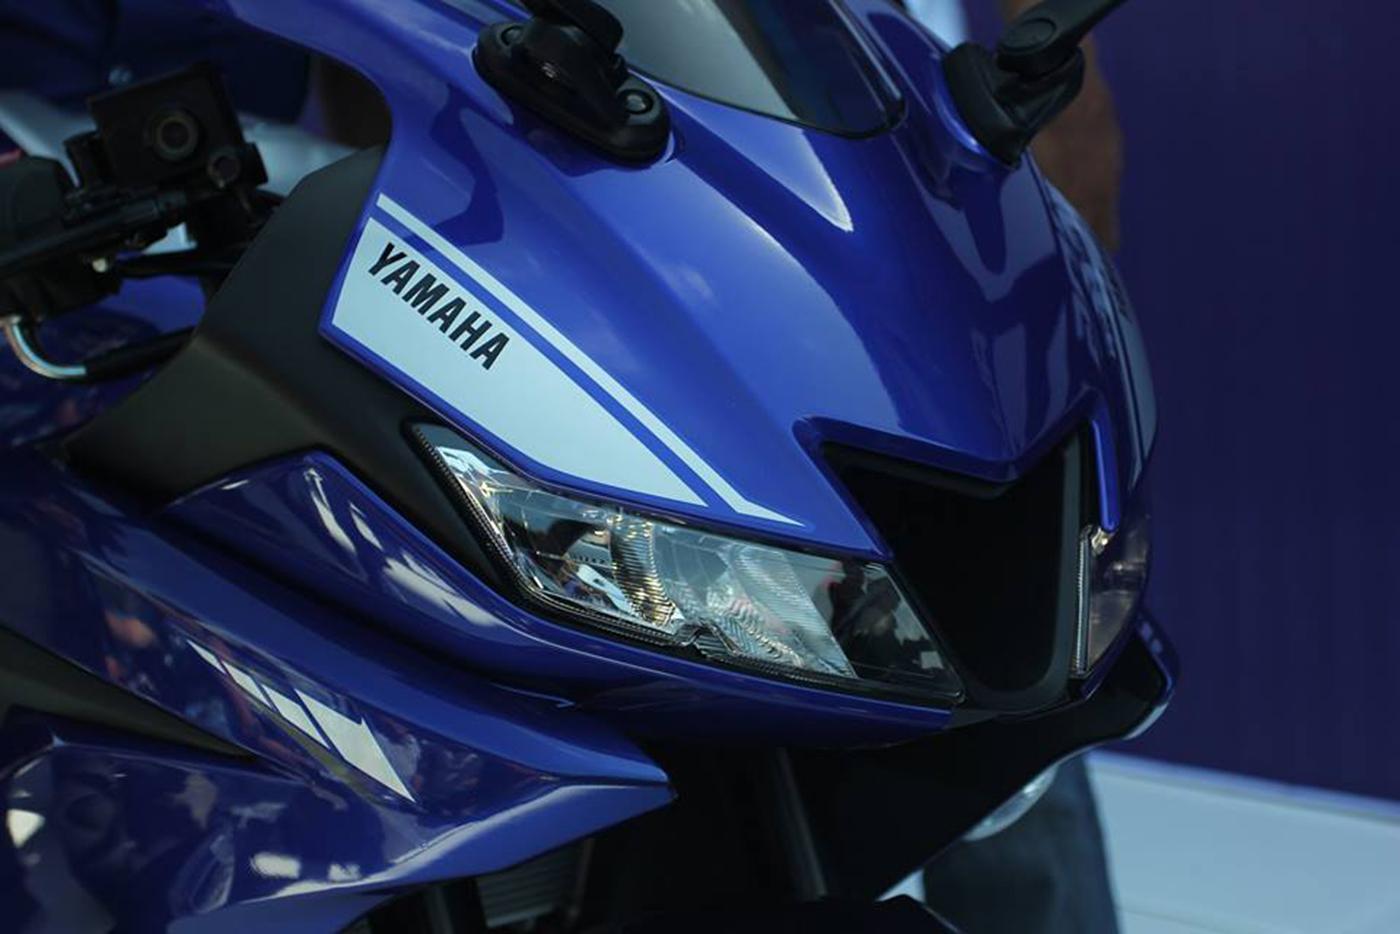 yamaha-r15-v30-racing-blue-front-headlamps.jpg